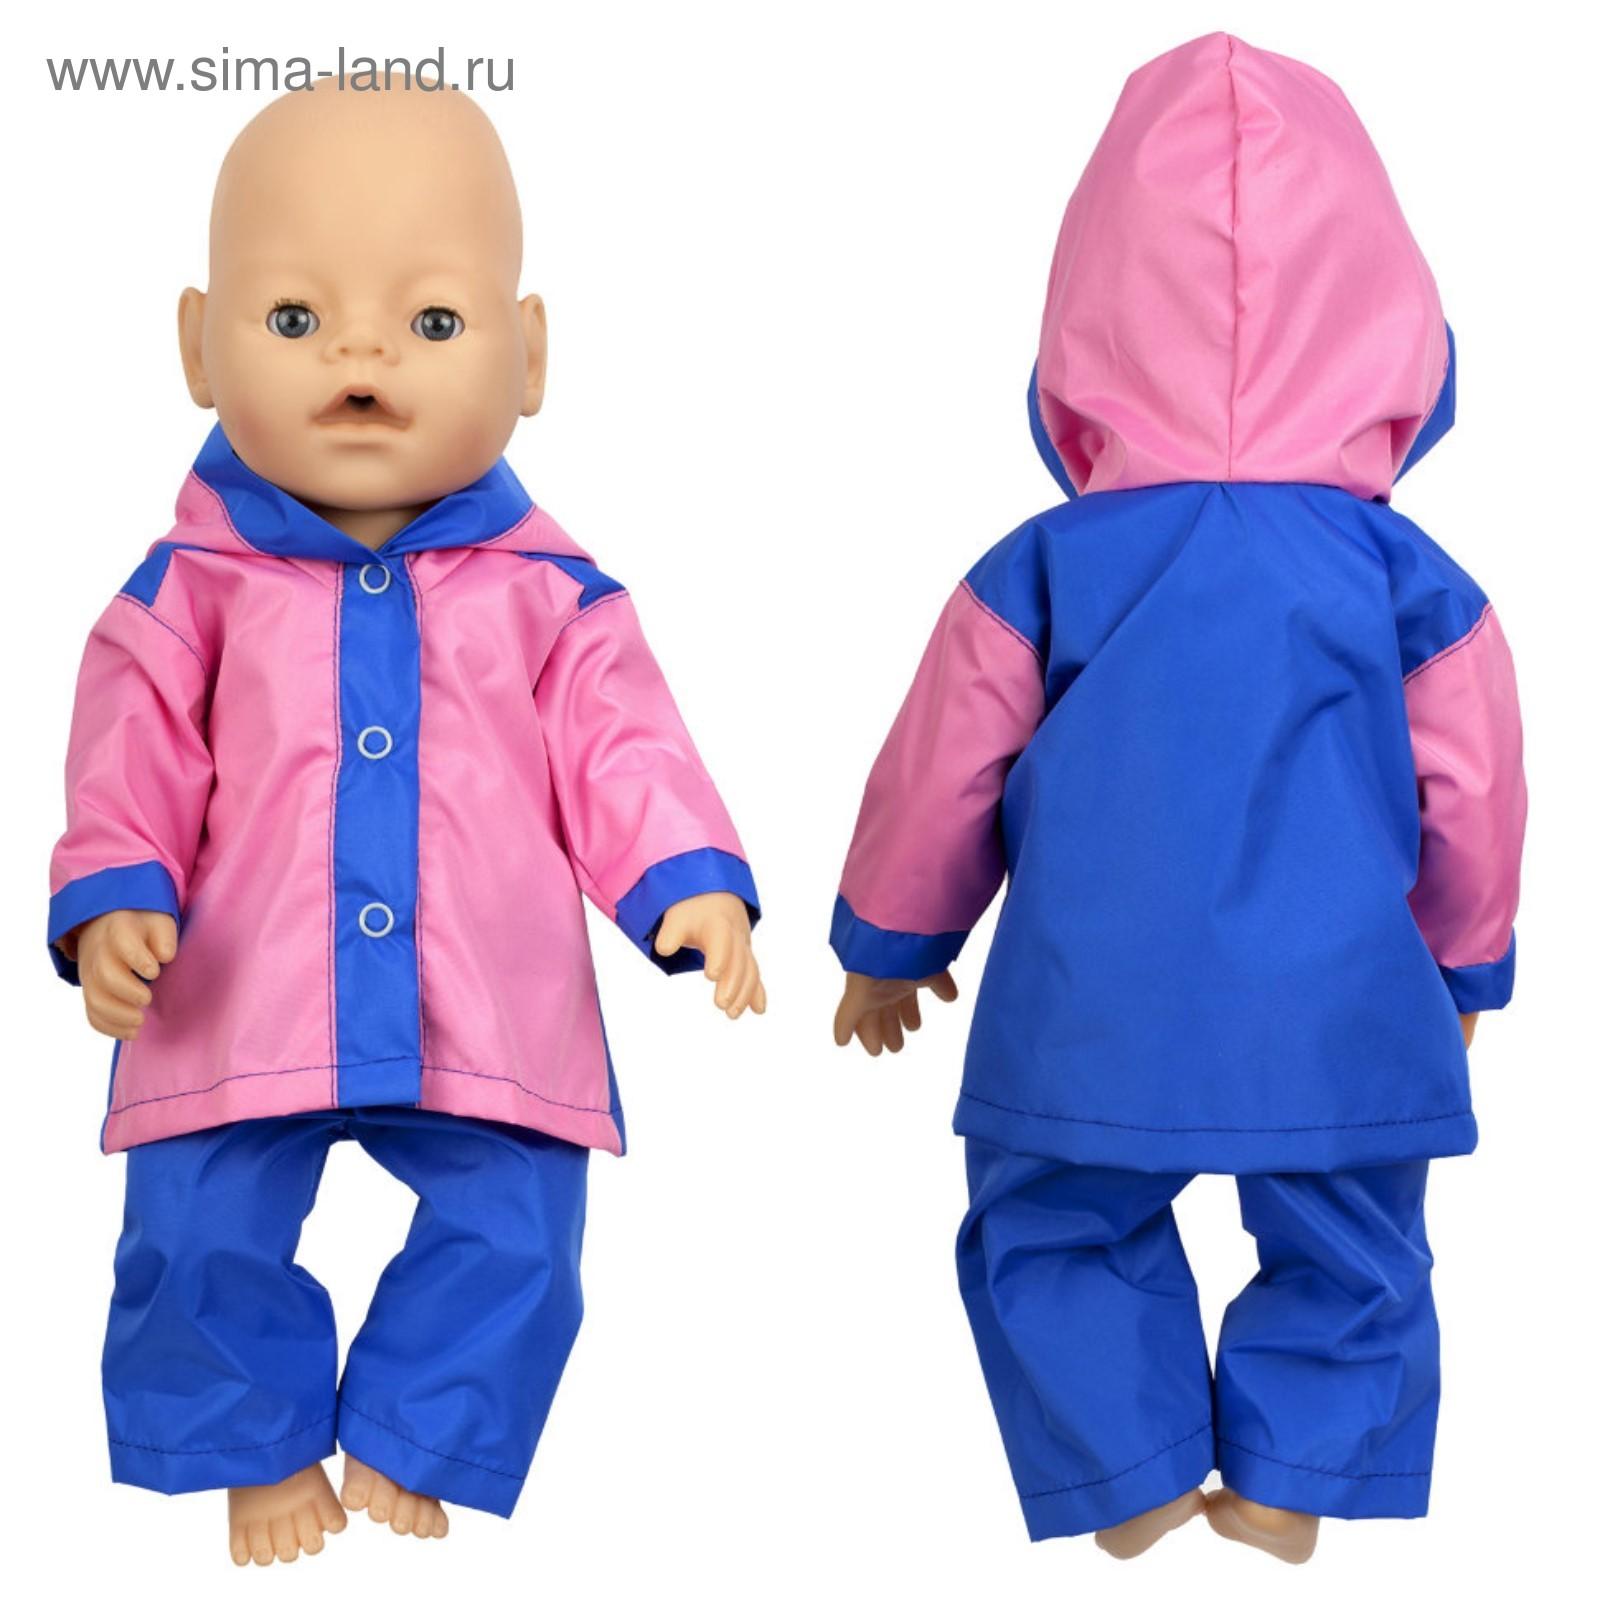 Одежда для кукол Baby Born р. 38-43 см